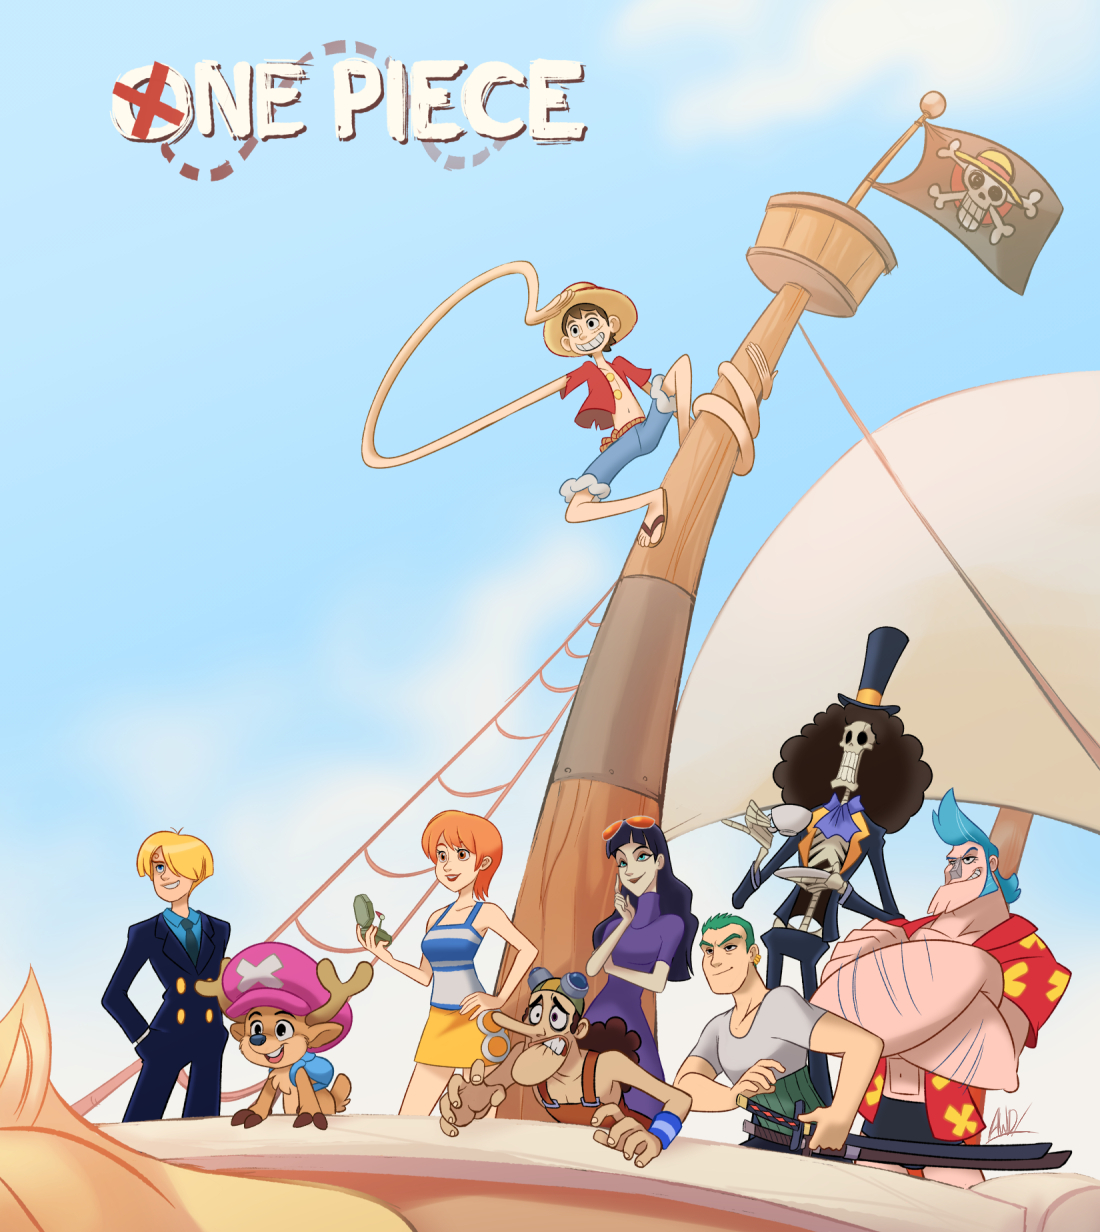 One Piece Happy 1000th!